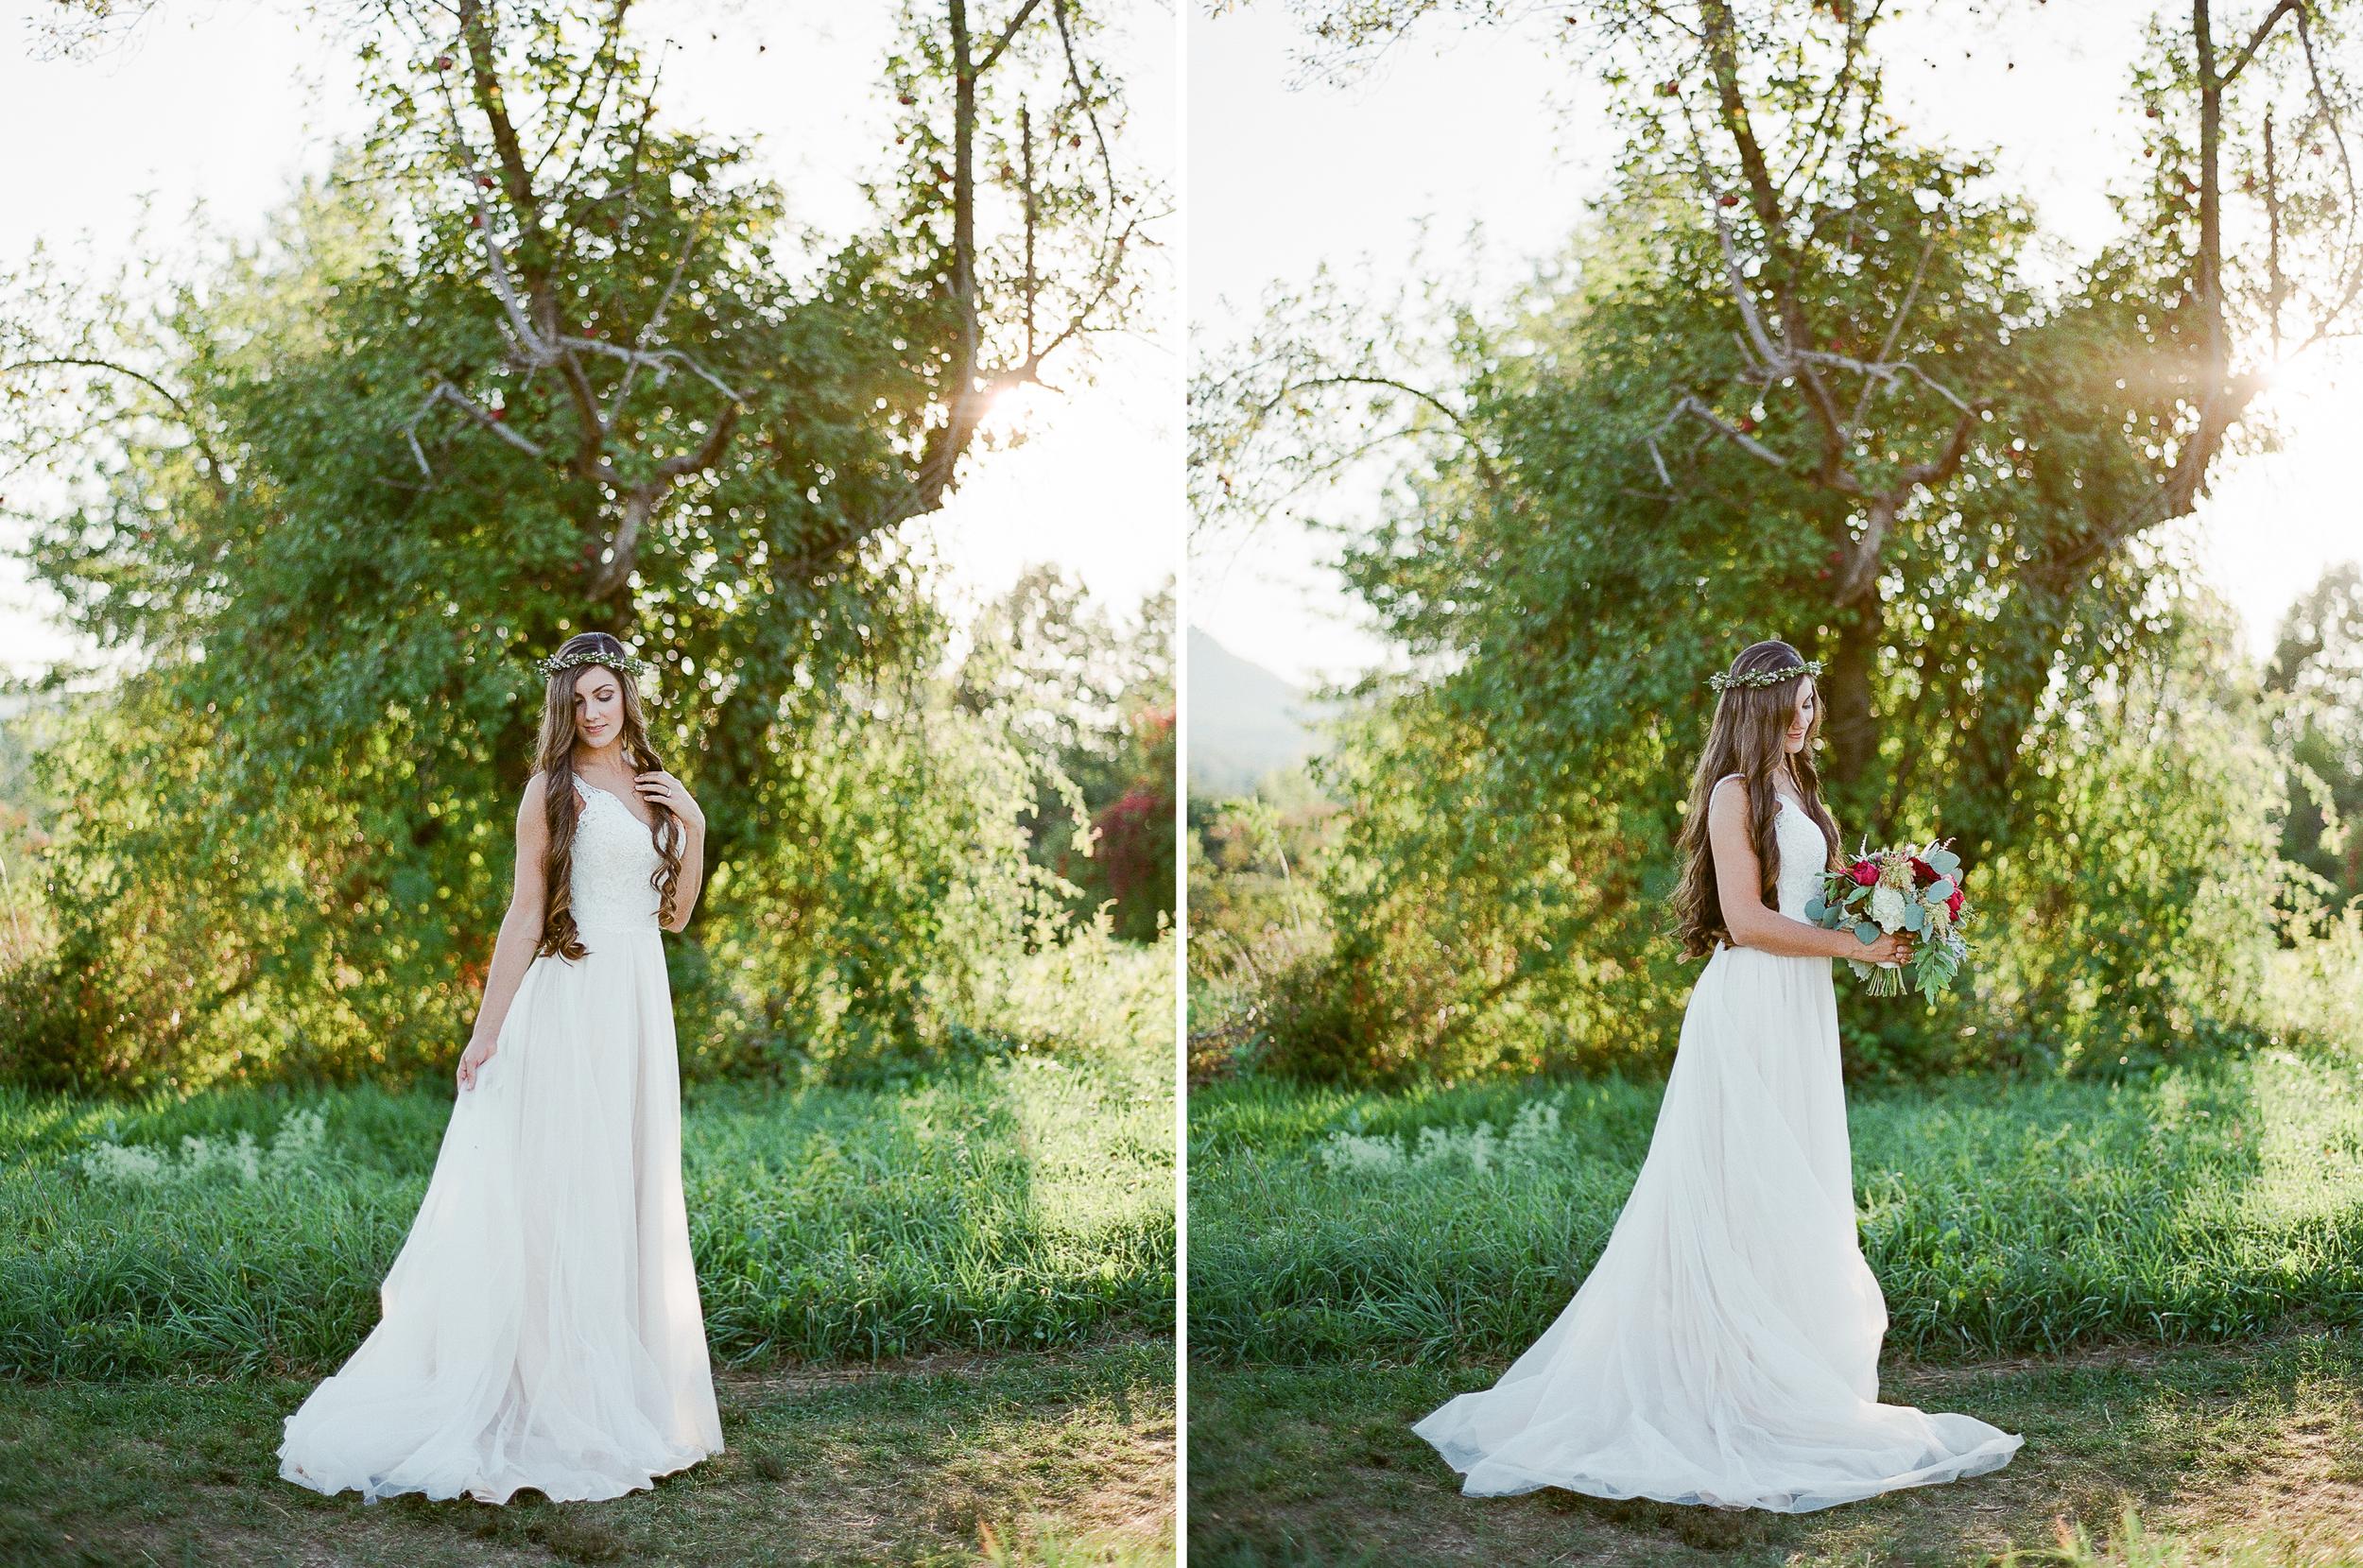 Romantic Bridal Inspiration by Melanie Zacek